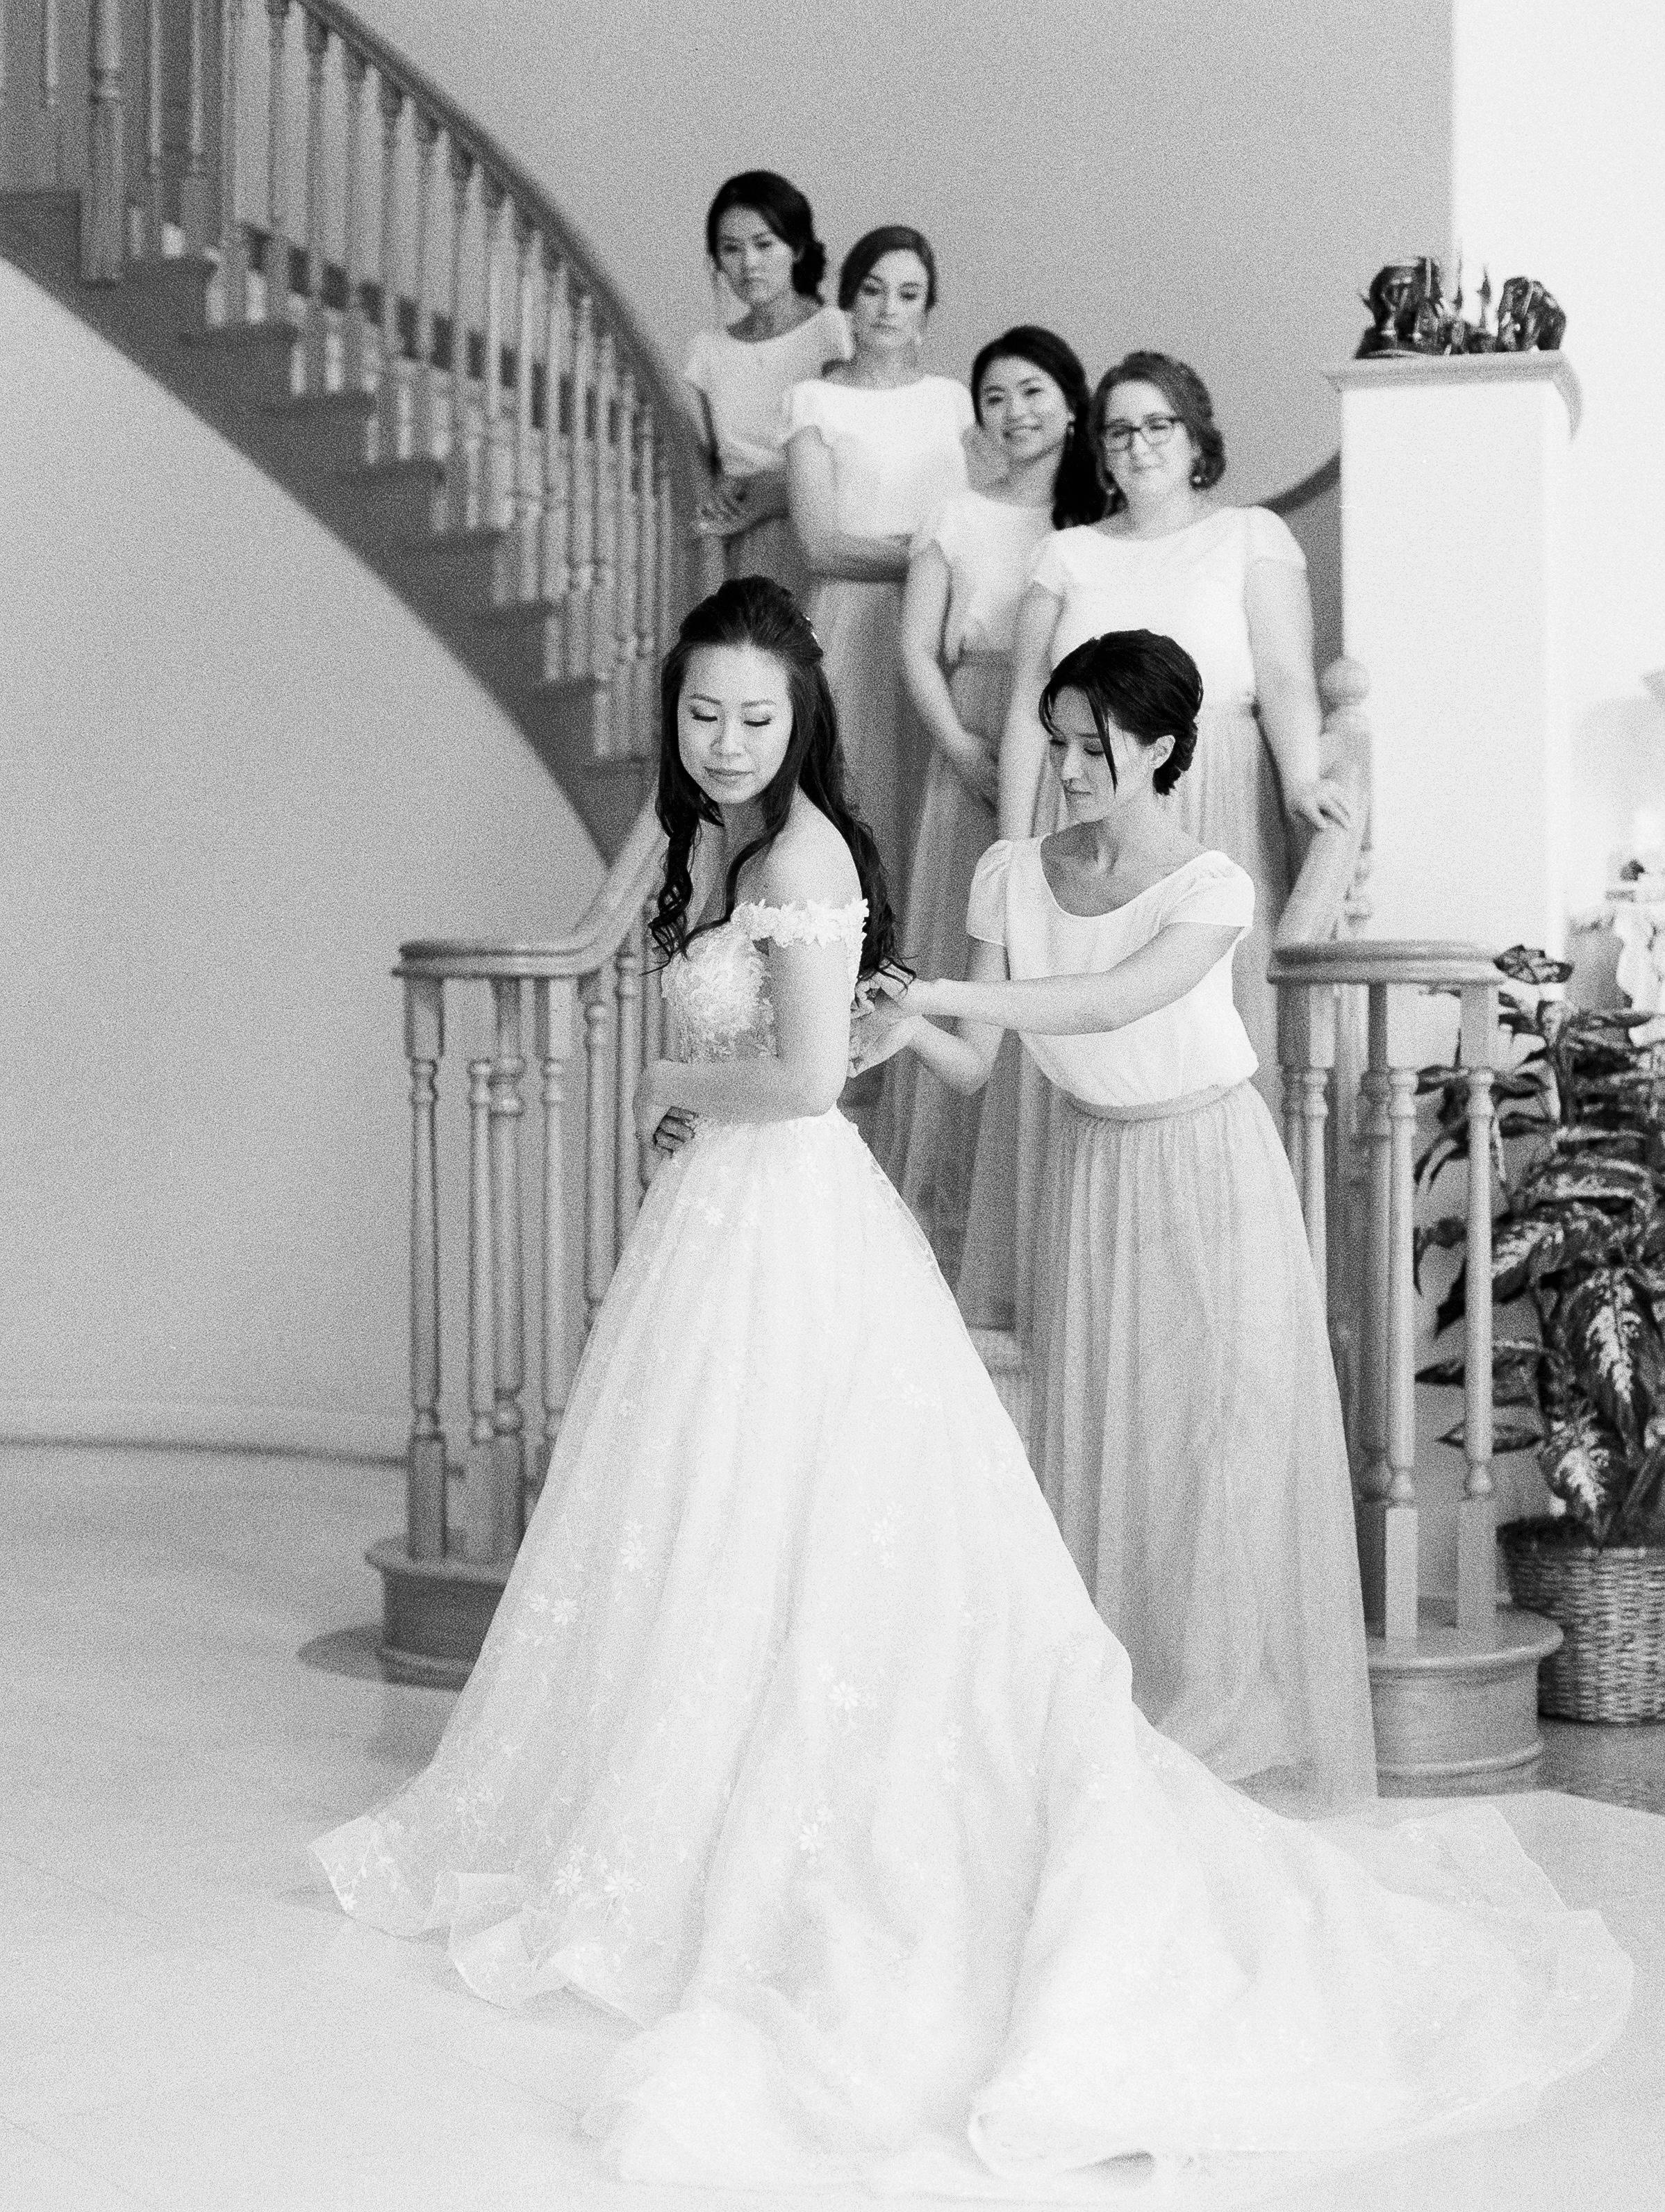 weddingaltadenatowncountryclubrachelallenbridegettingready-10.jpg